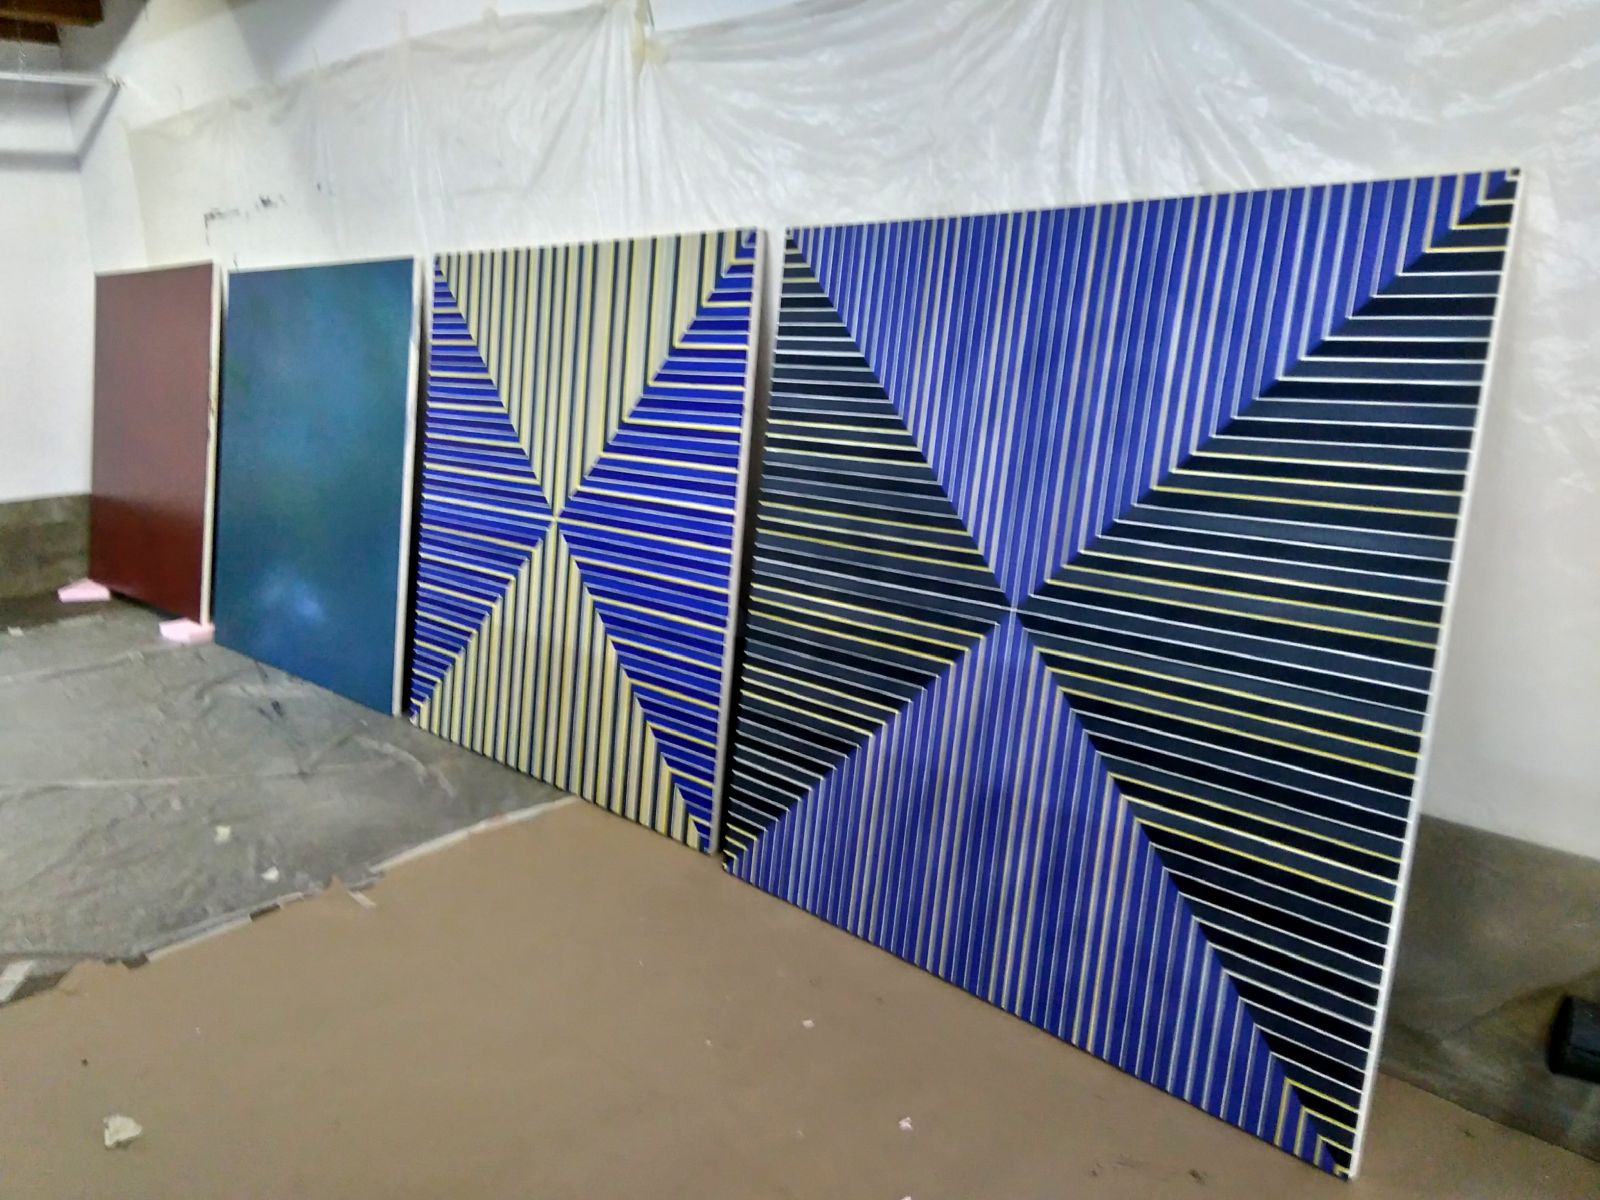 Atelier Christian Eder, Burgenland